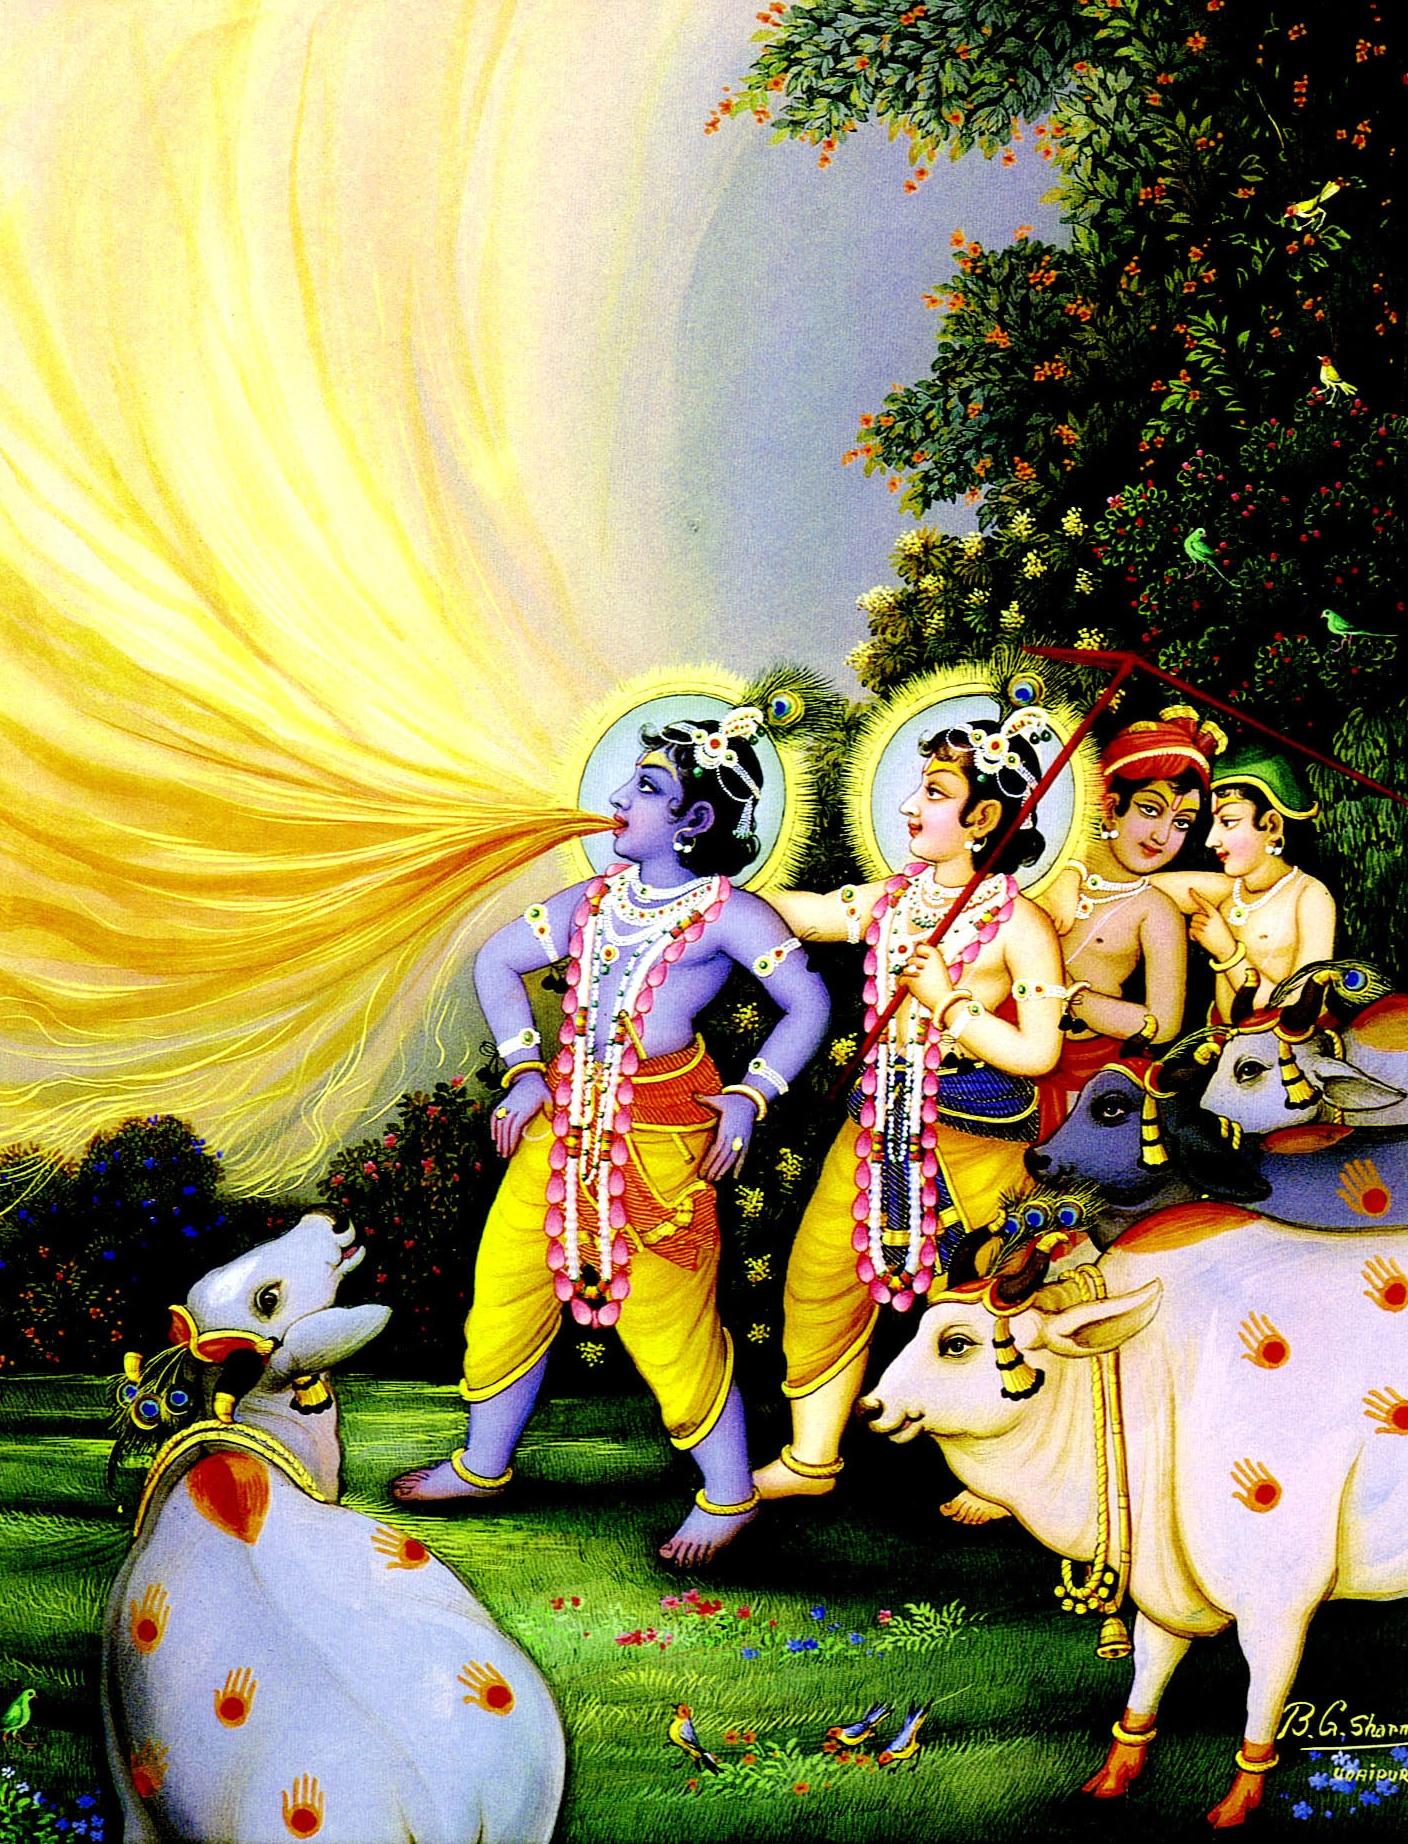 The Transcendental Art Of B G Sharma The Hare Krishna